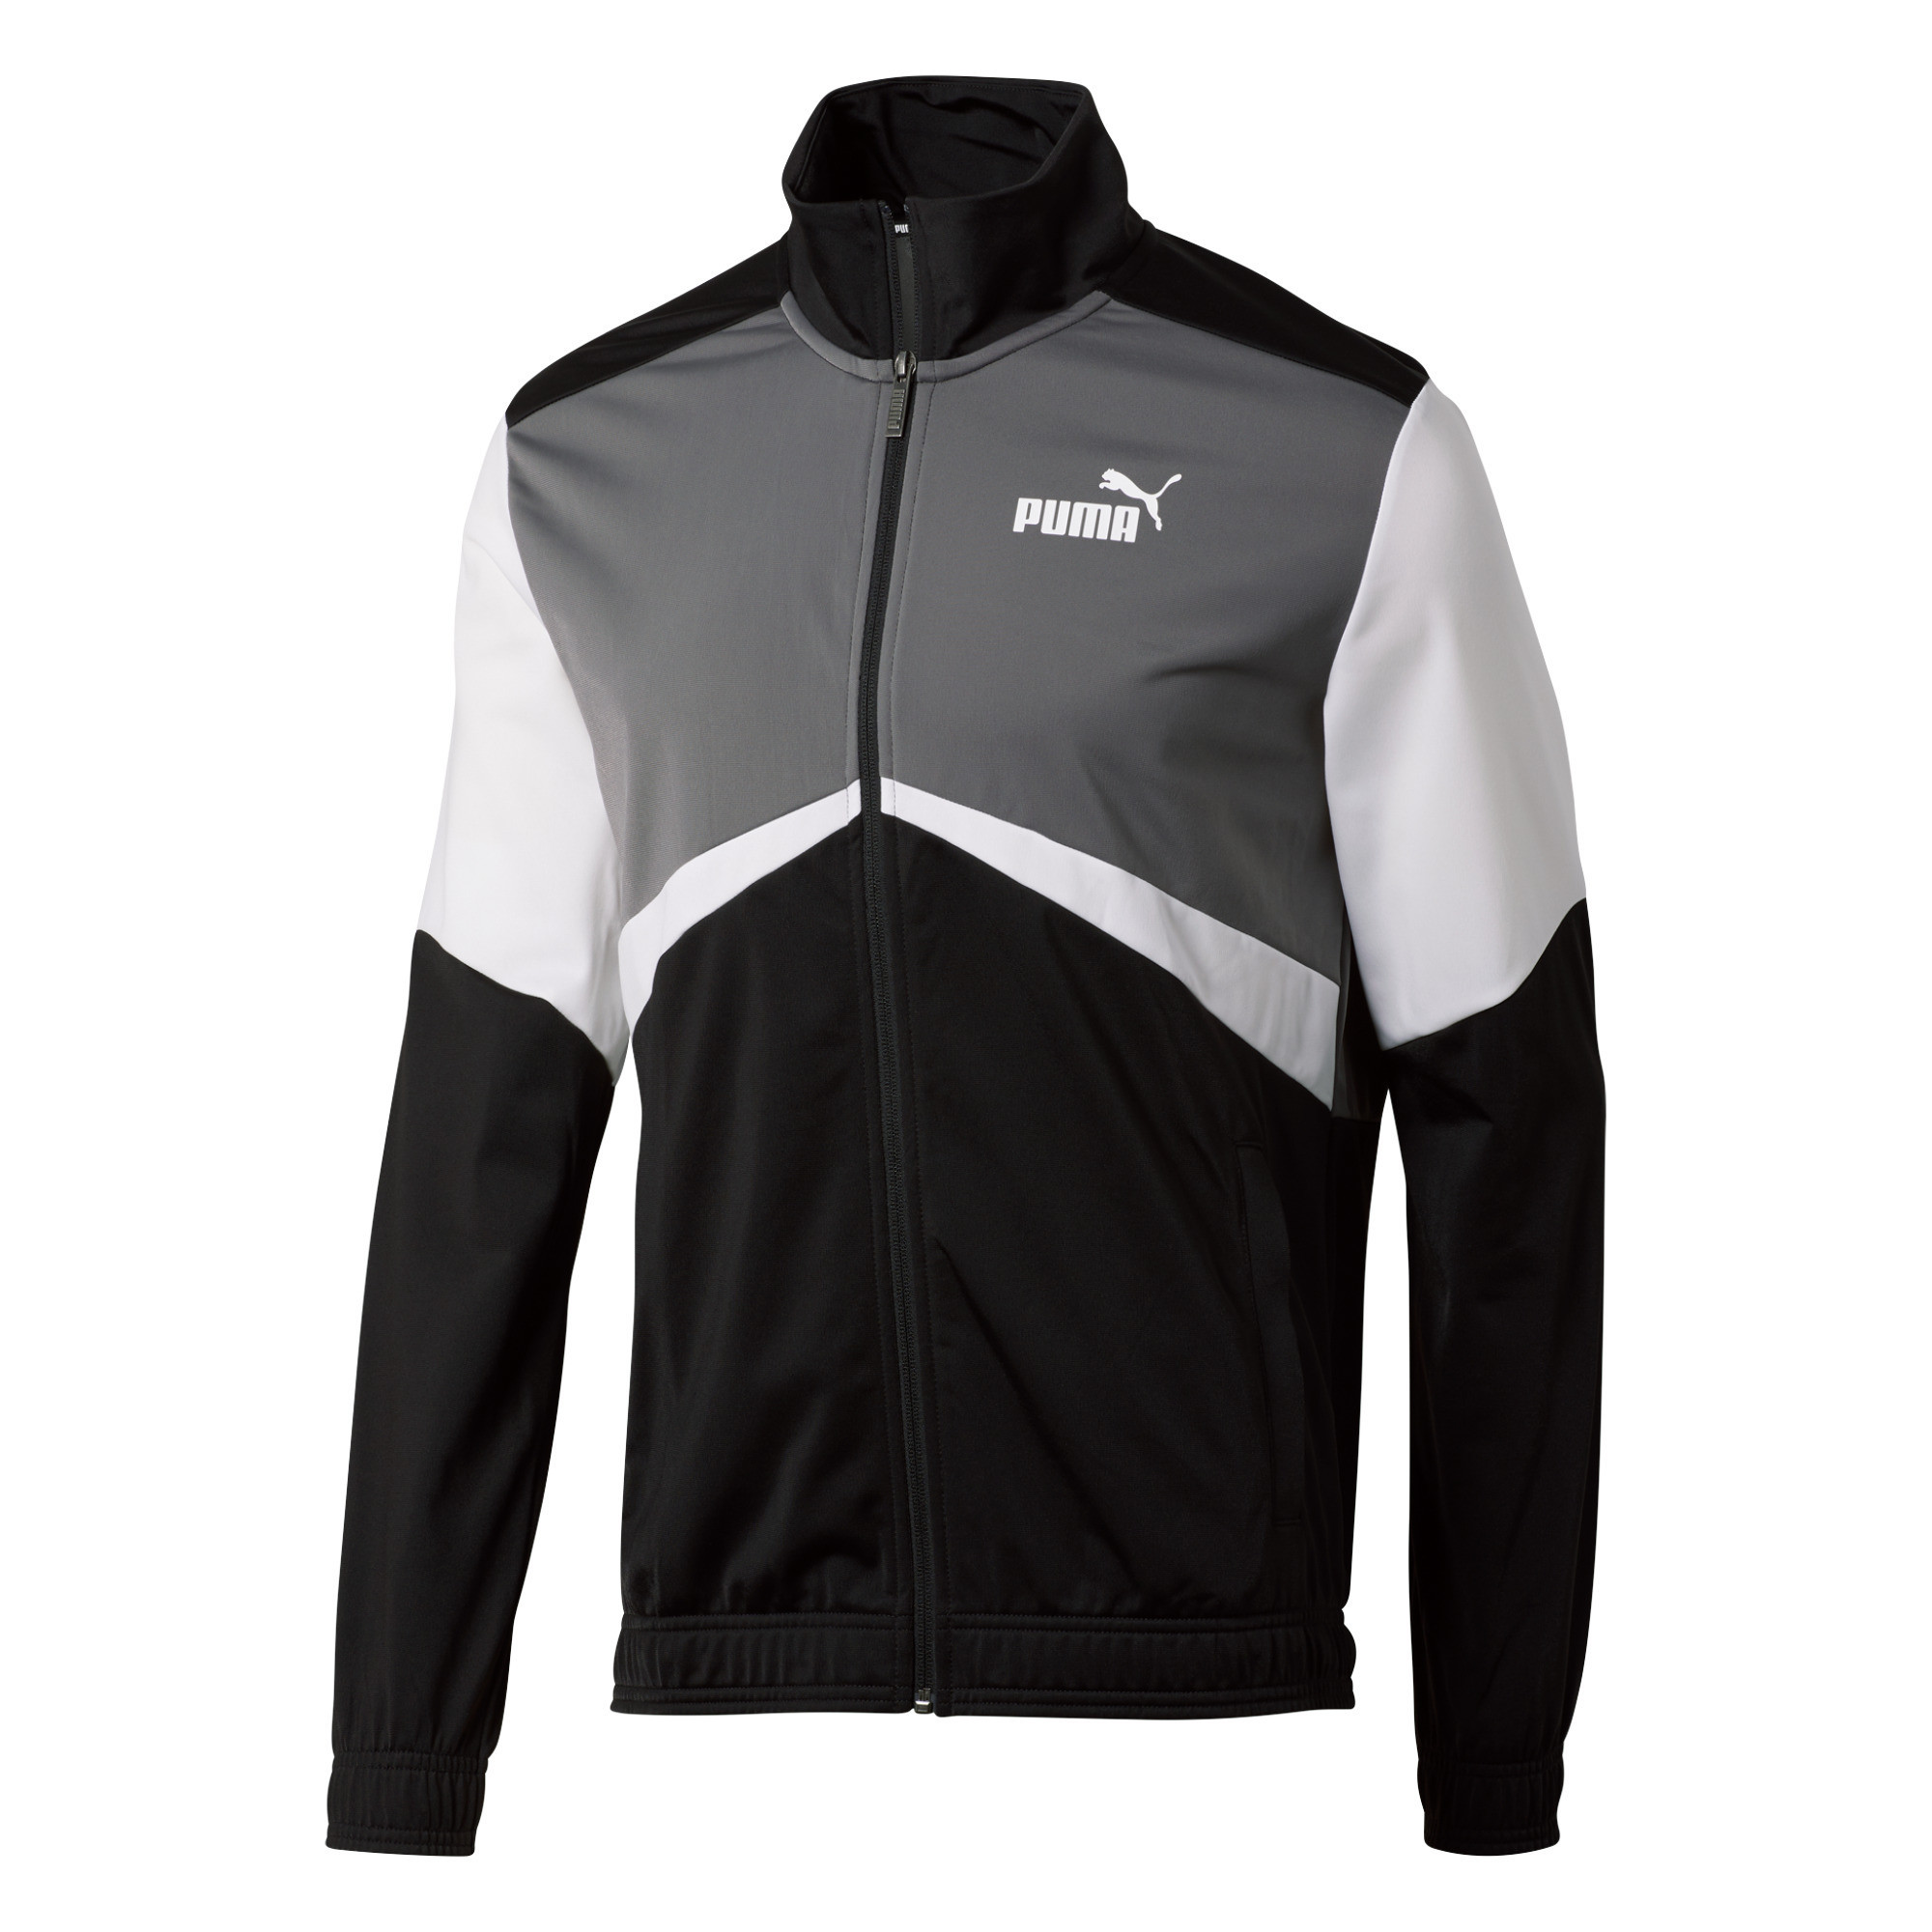 Imbracaminte Barbati PUMA CB Retro Track Jacket Puma BlackCastlerockPuma WhitePuma White